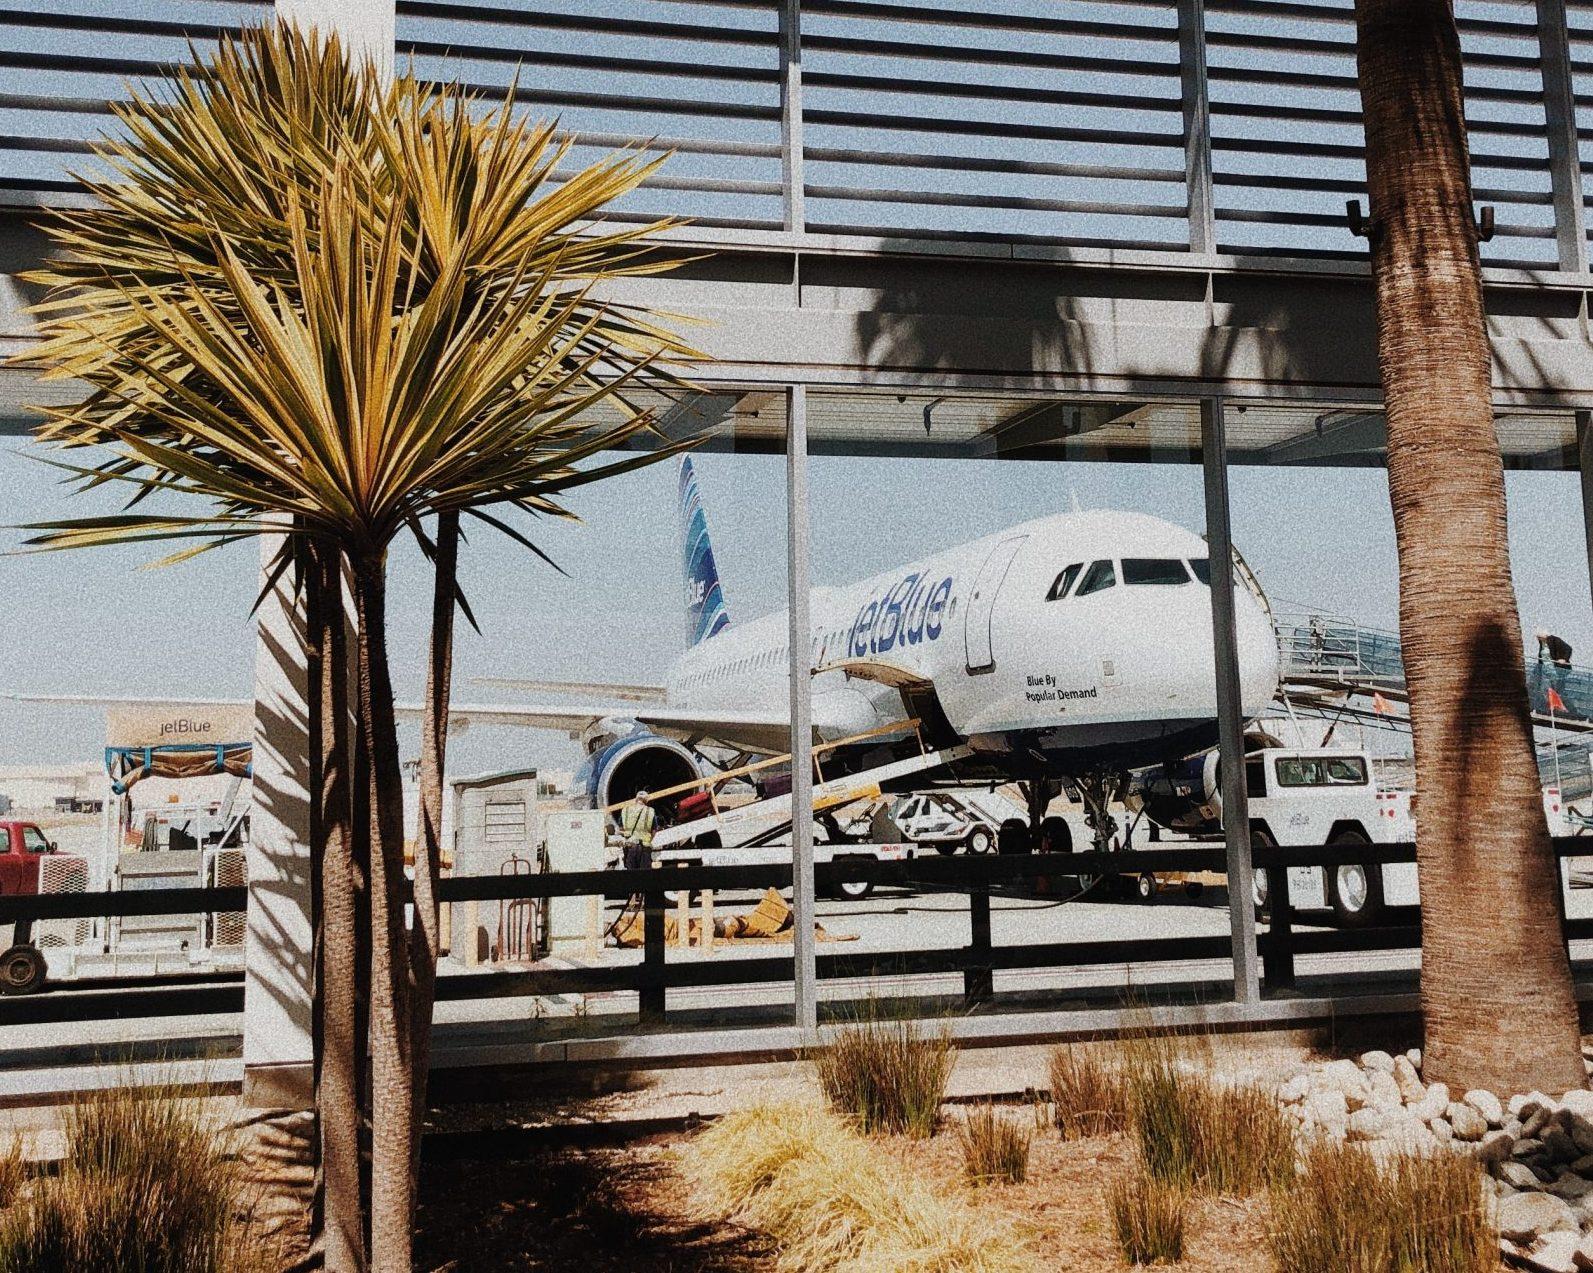 JetBlue is no longer a transfer partner of Marriott Bonvoy